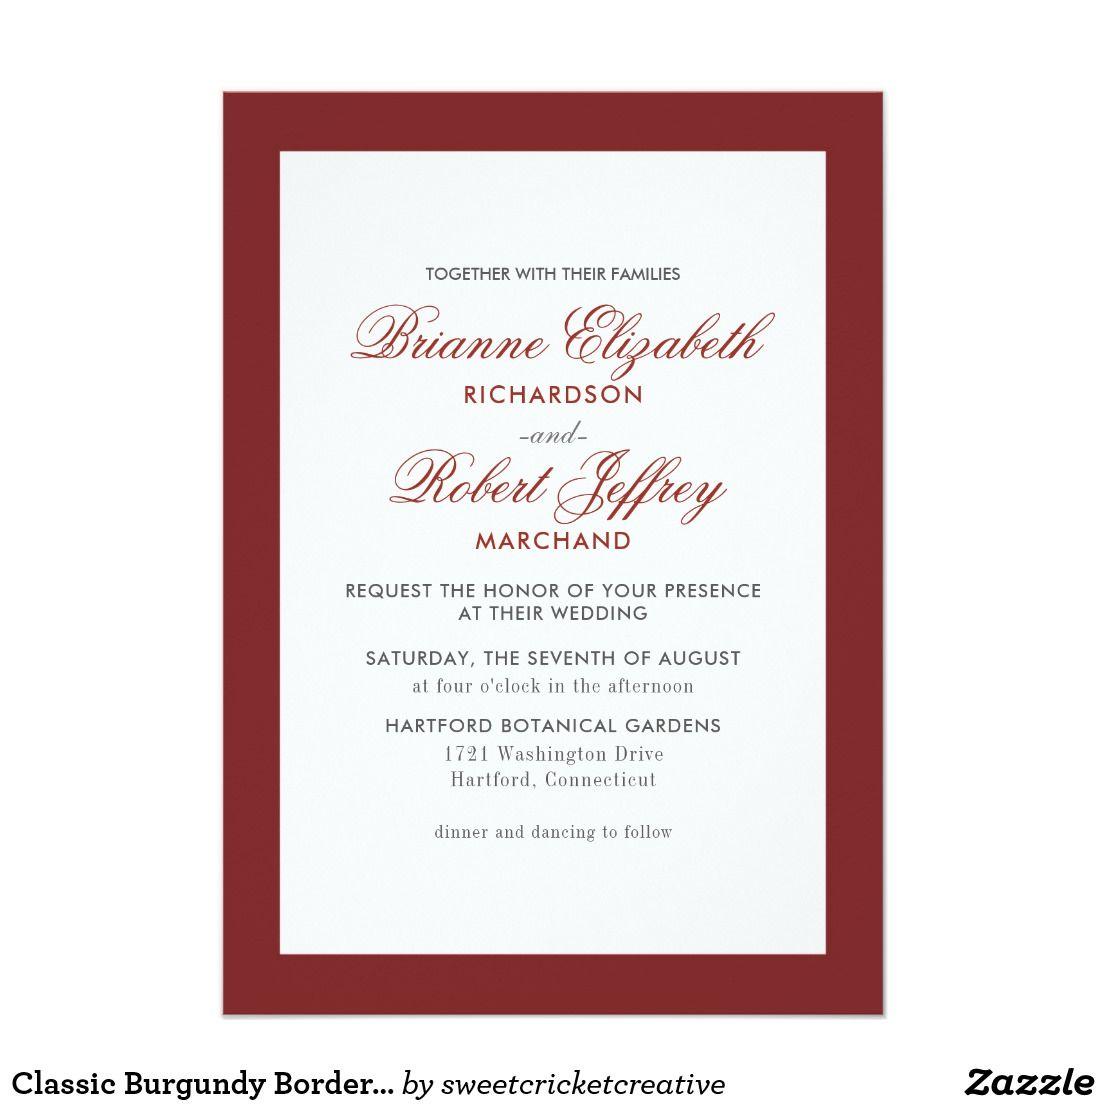 Classic Burgundy Border Formal Wedding Invitation | Formal wedding ...